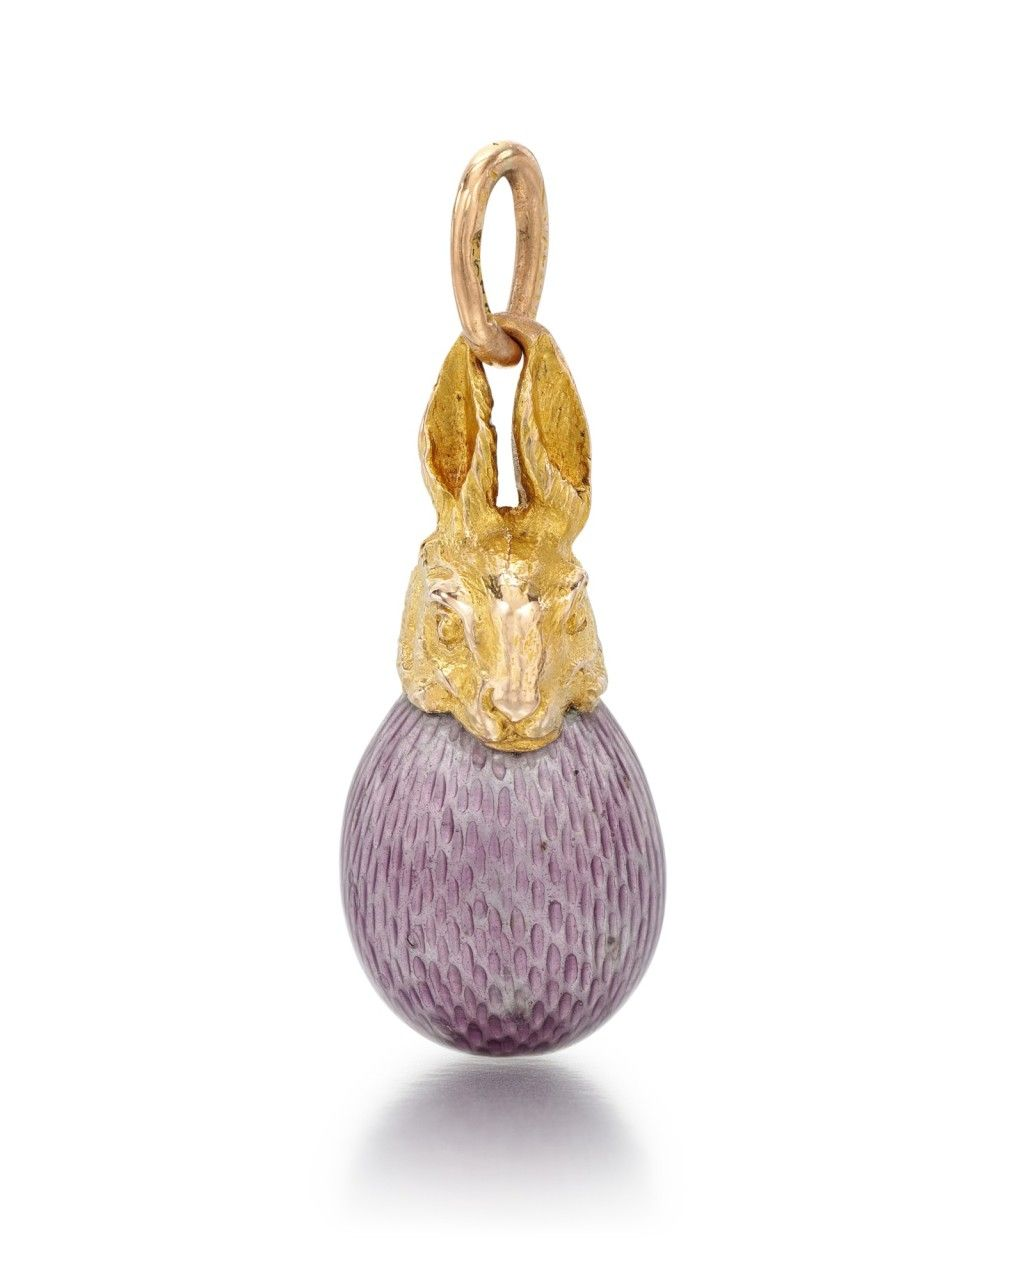 Russian Handmade Egg Pendant  Decorative Enamel Pendant